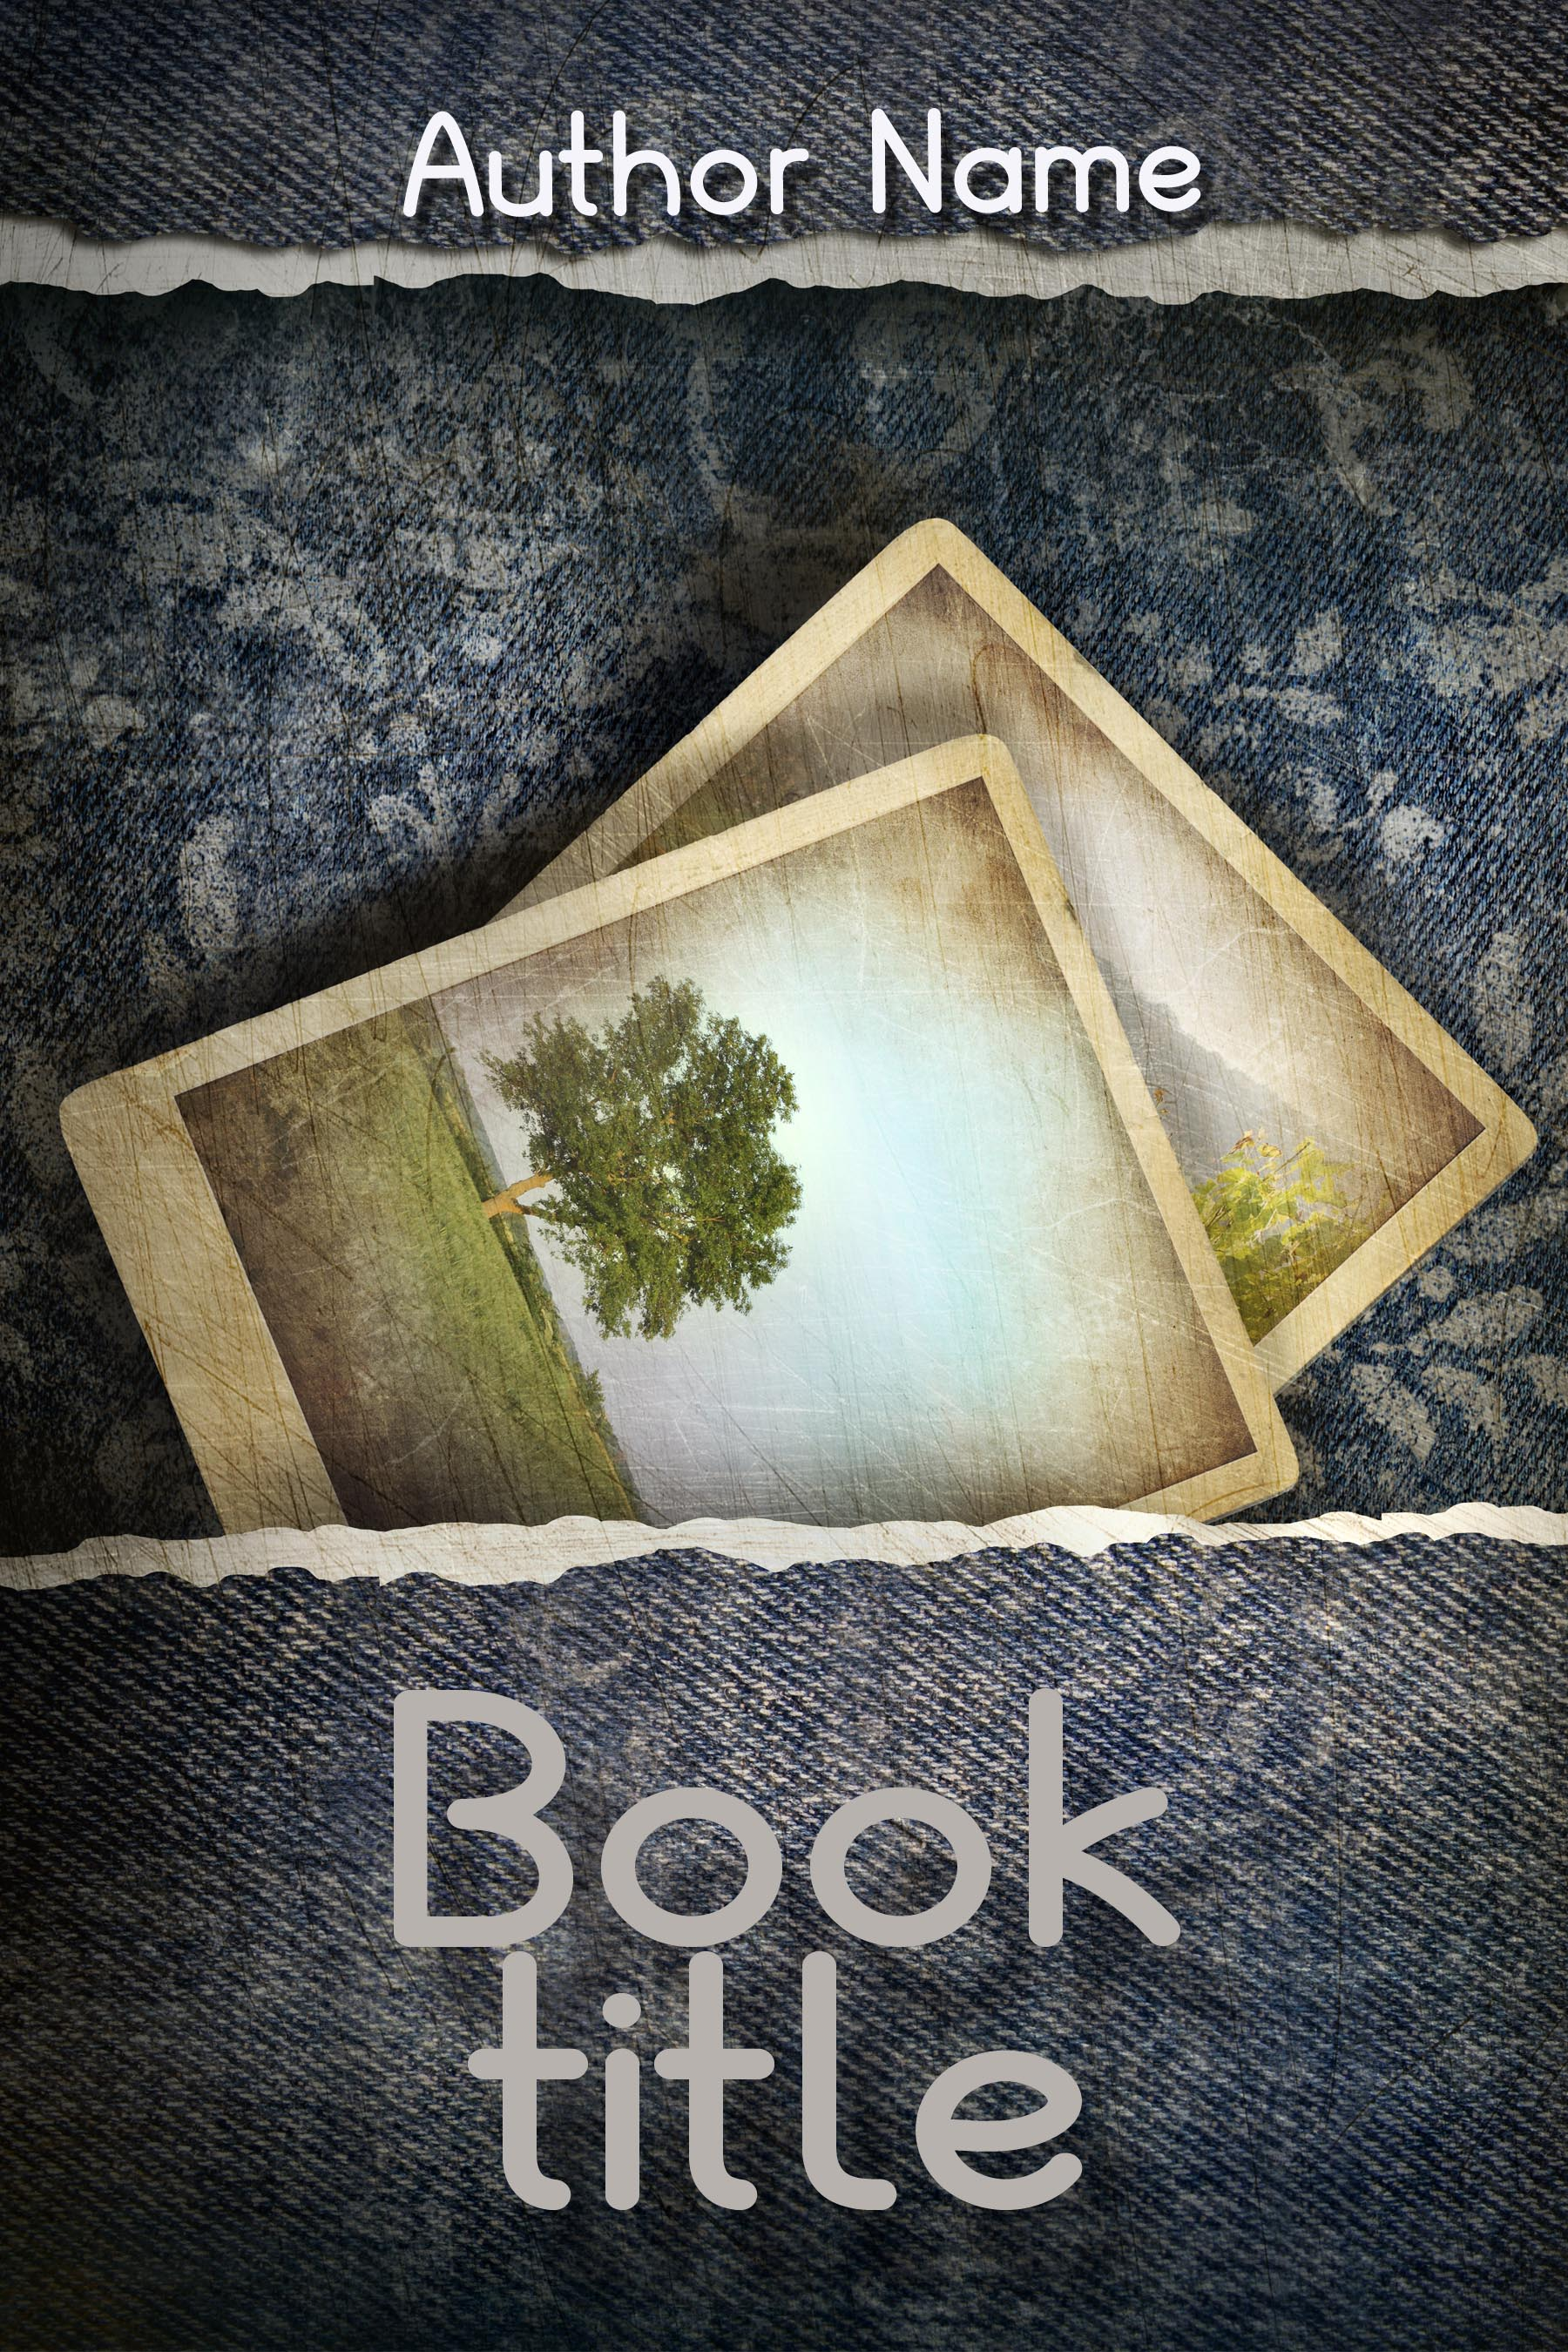 Fantasy Adventure Book Cover : Premade fantasy book covers the cover designer